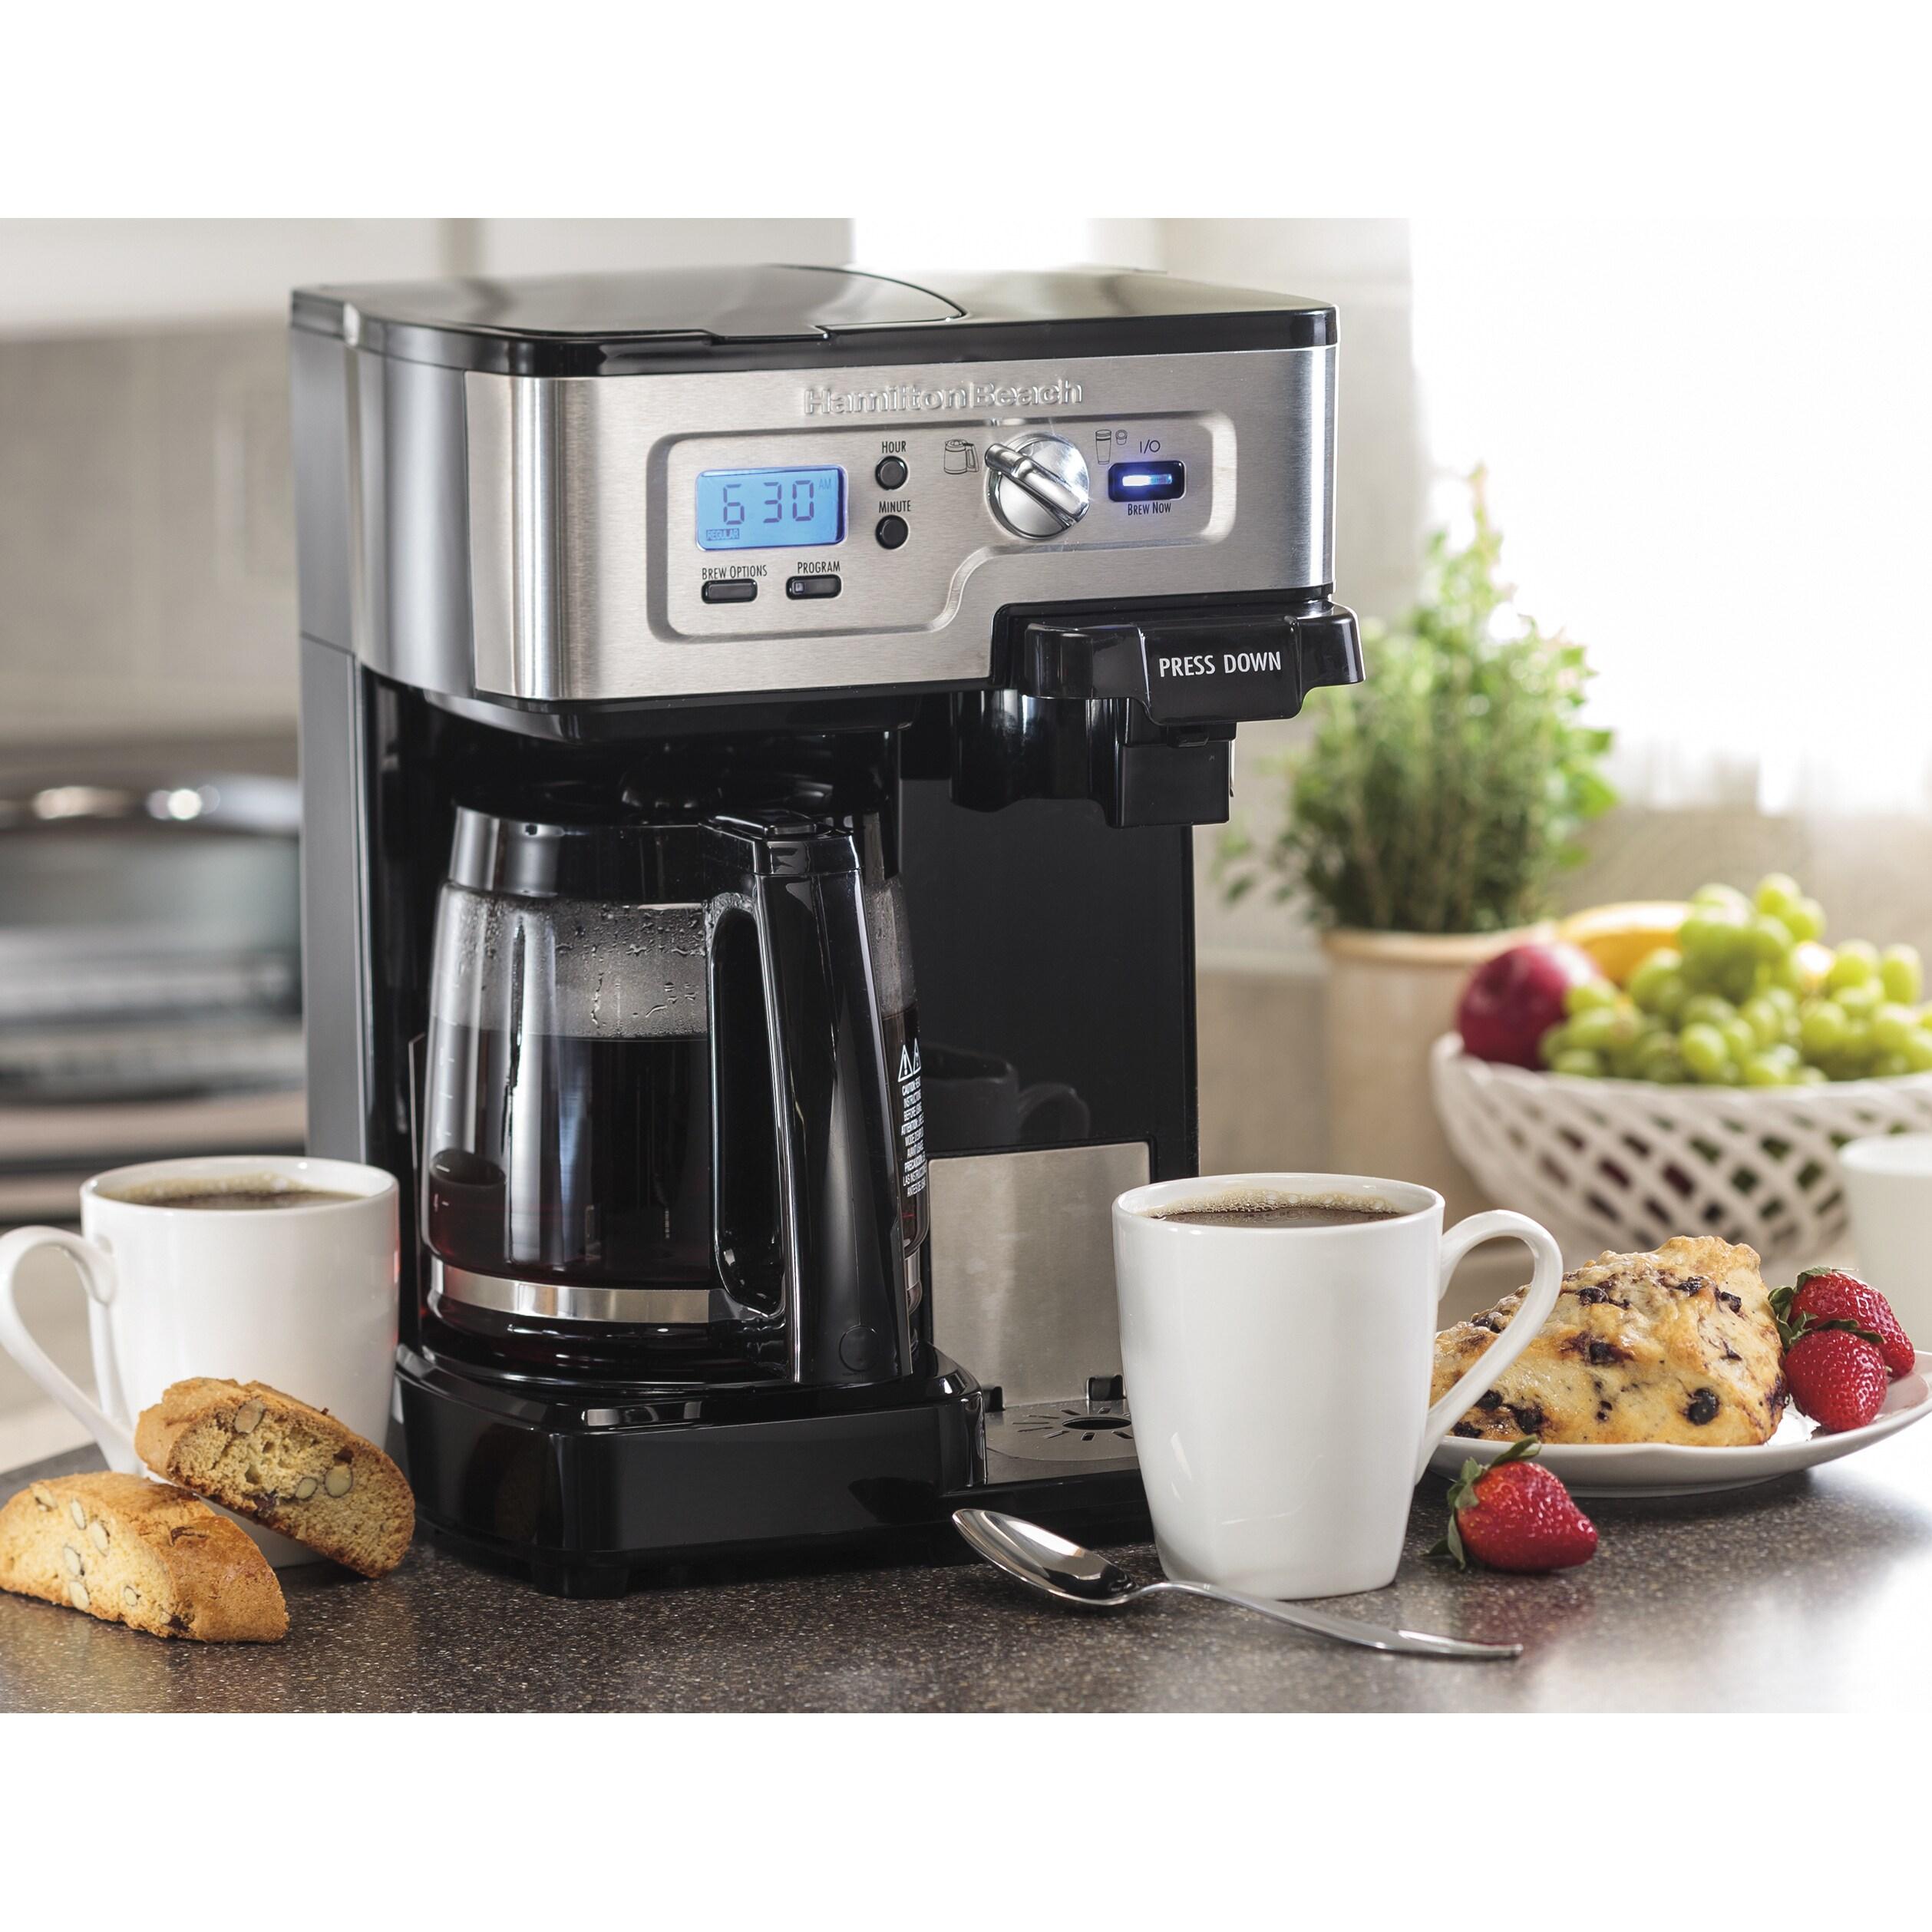 Hamilton Beach Two-Way FlexBrew Coffee Maker (Manufacture...